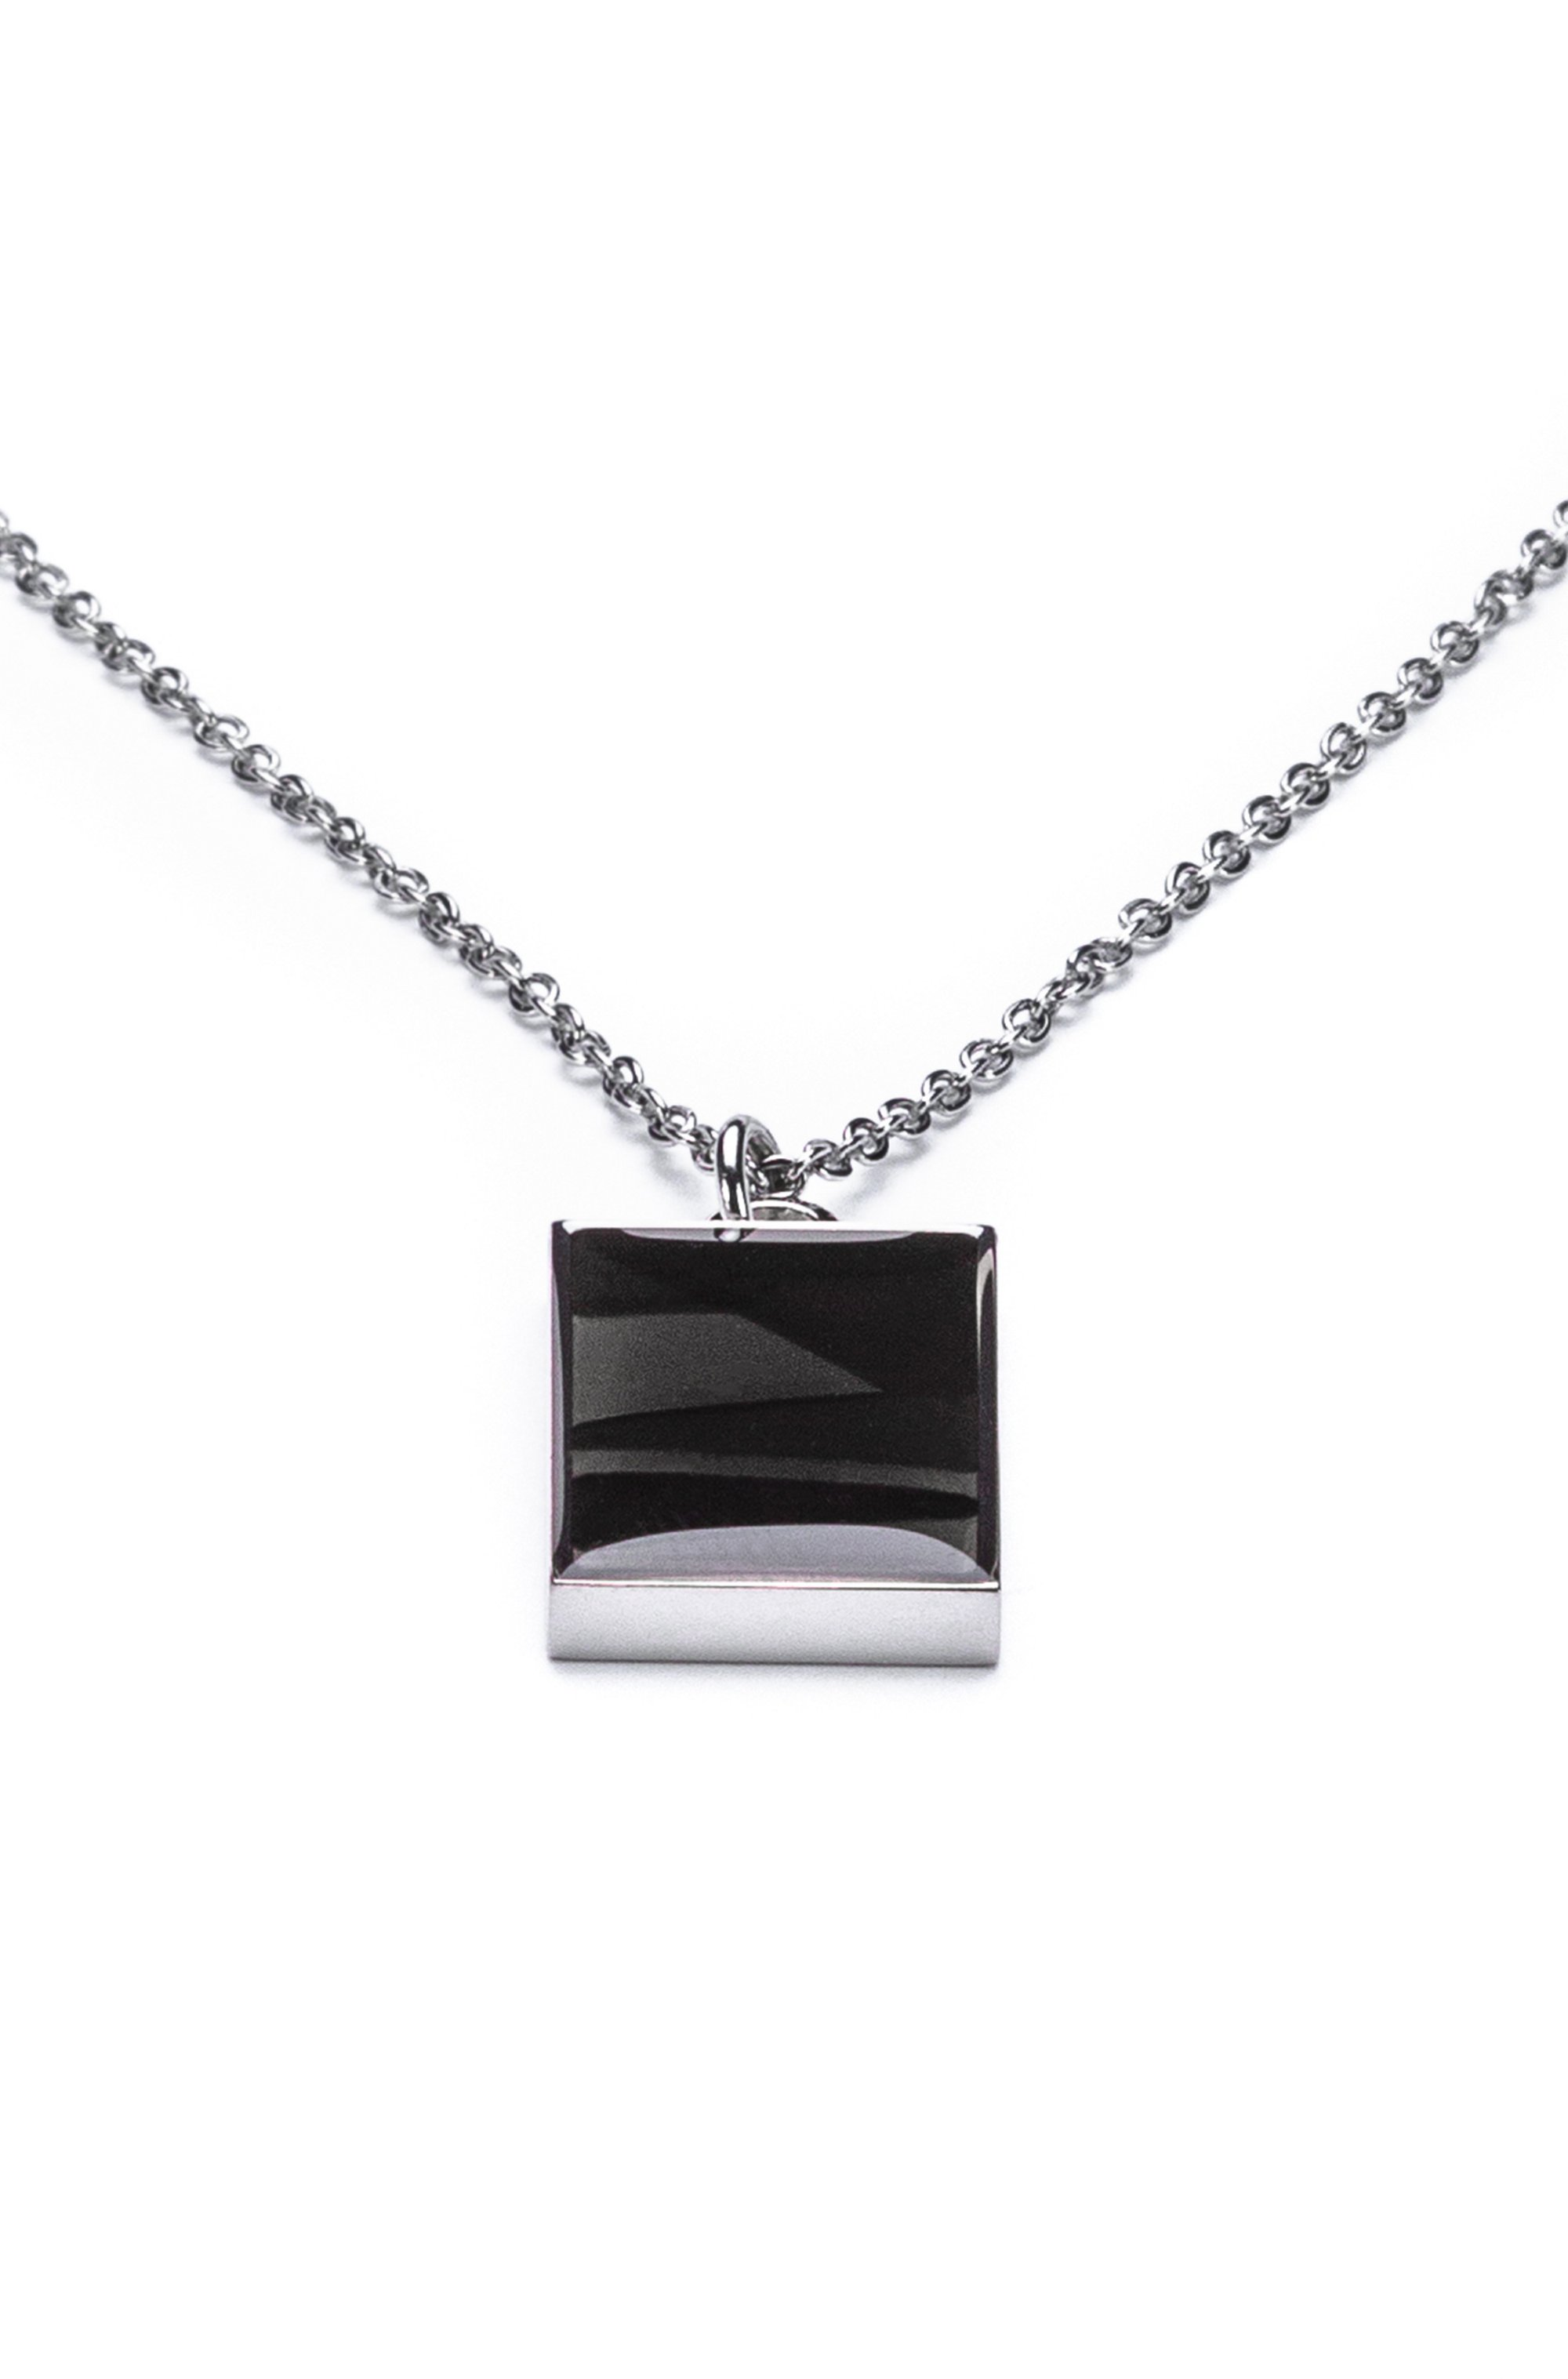 Enamel pendant necklace with carabiner closure